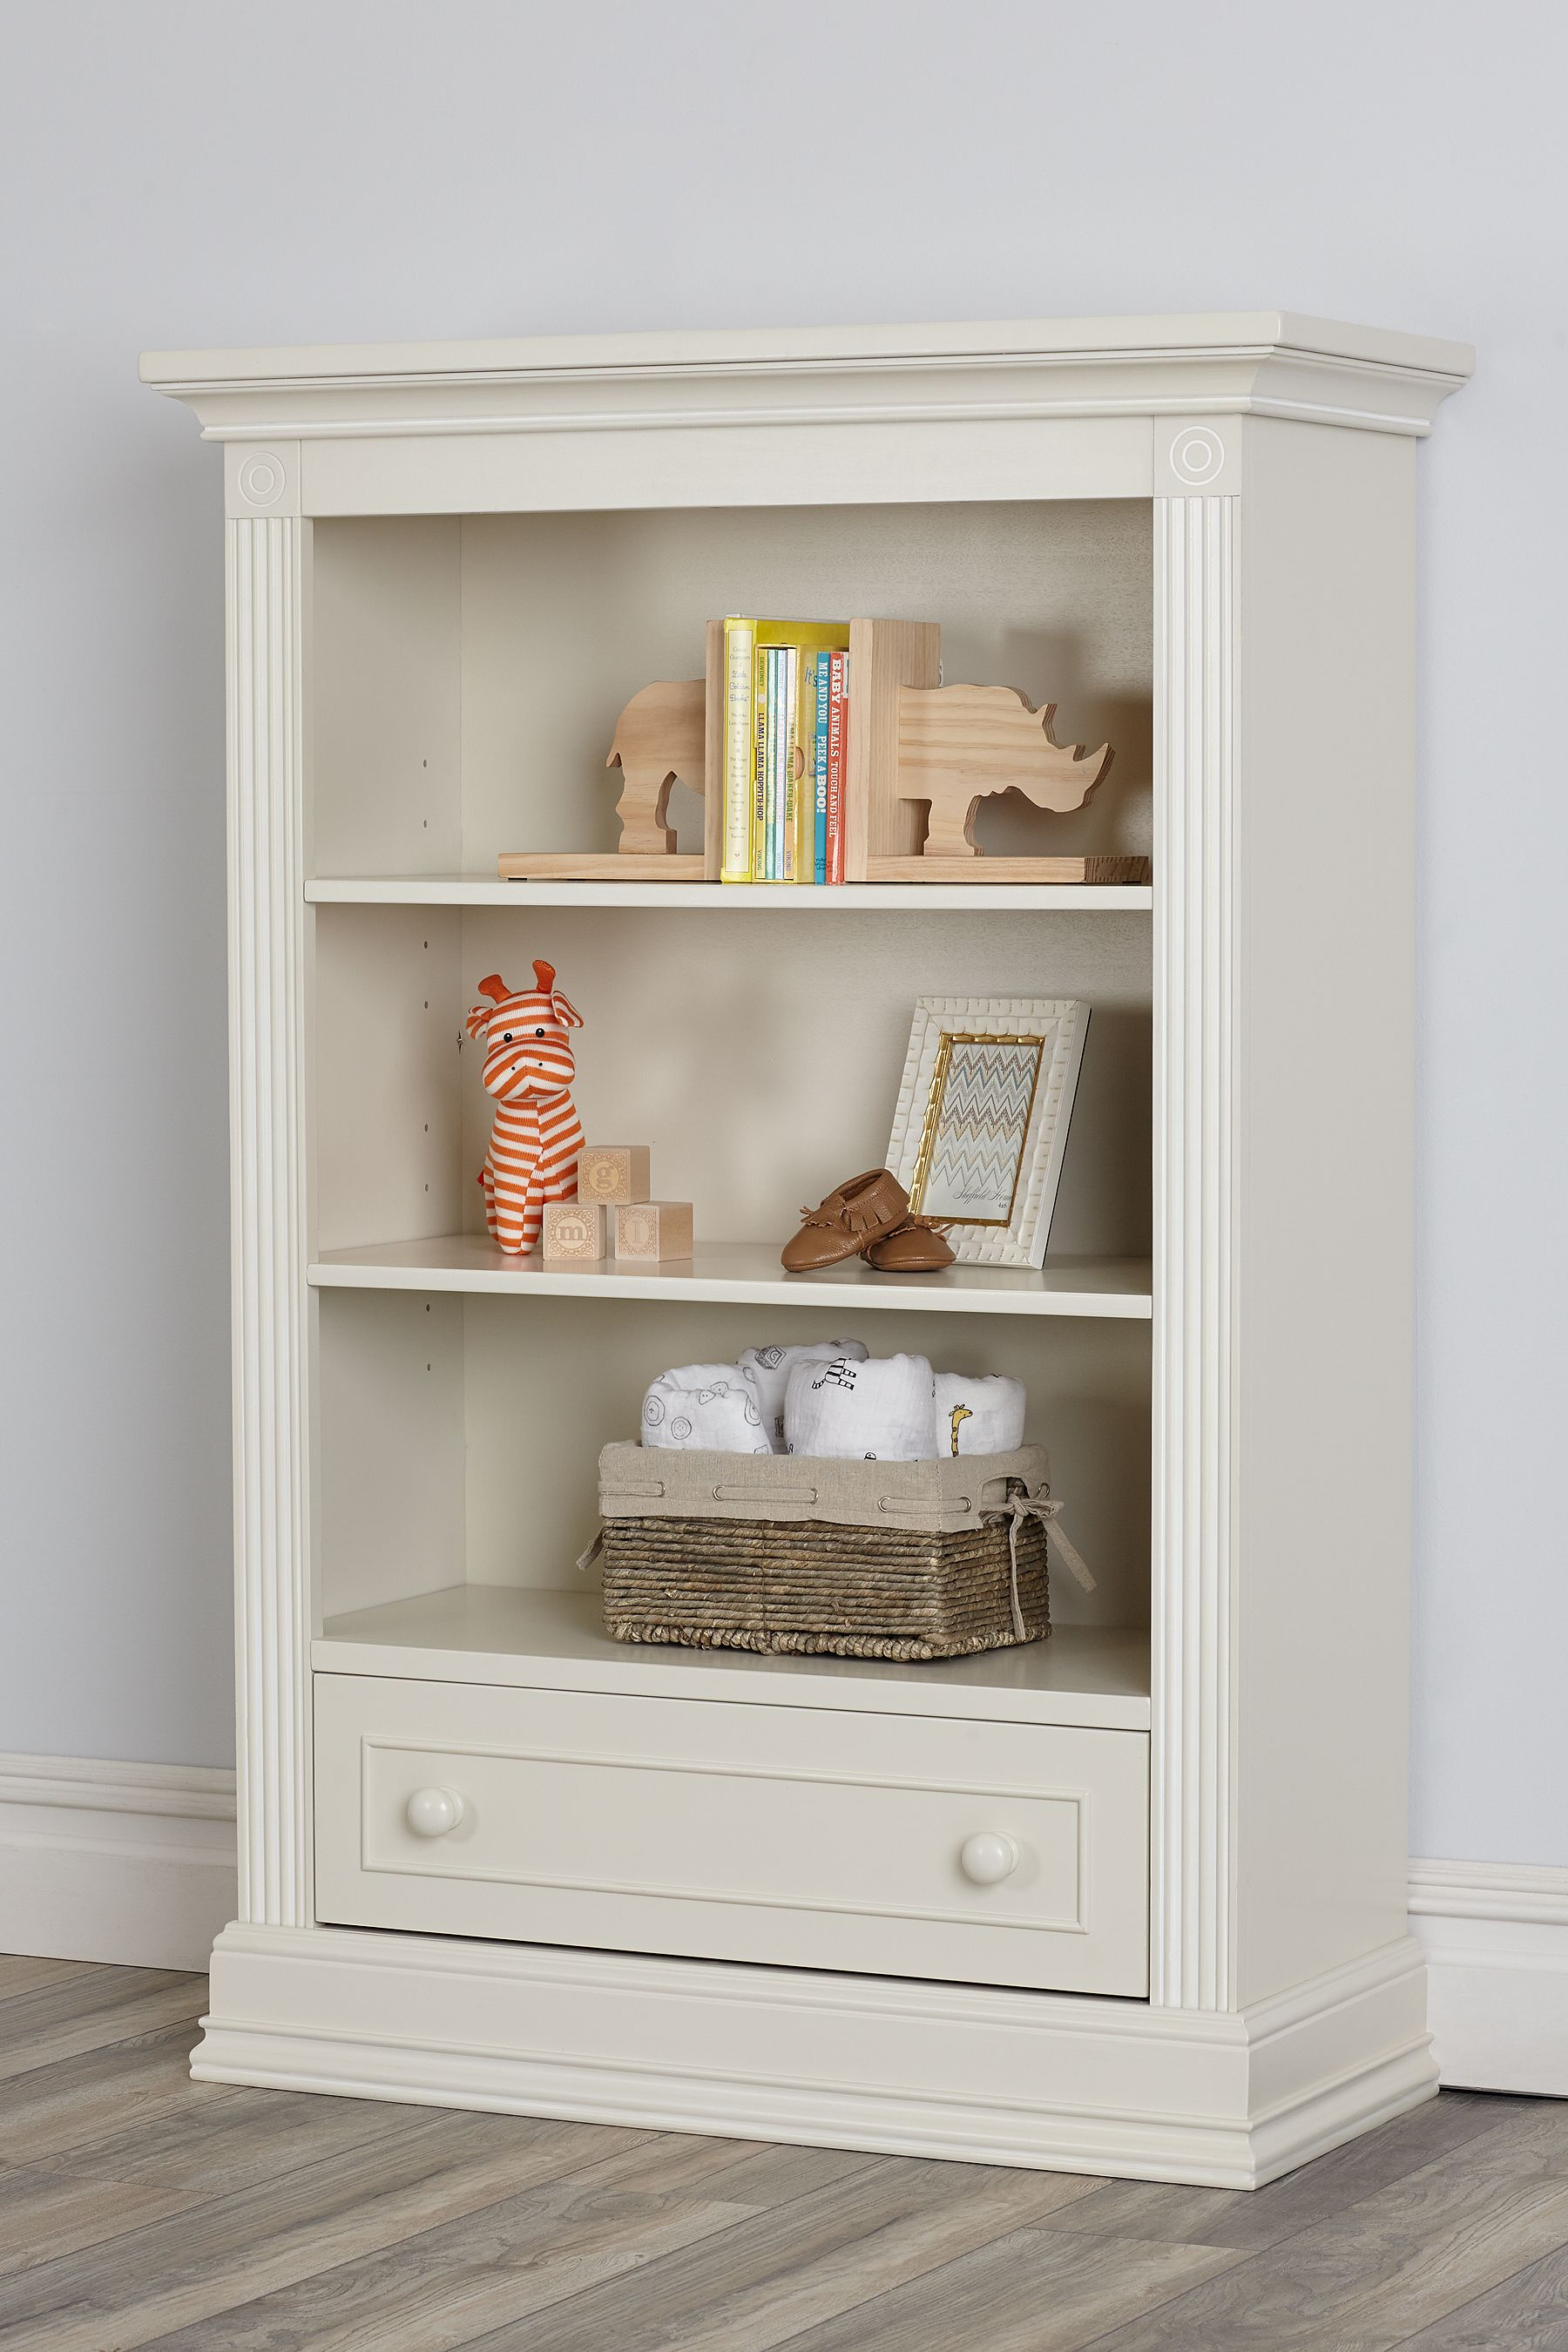 ip walmart bookcase shore smart baby canada south basics black en shelf